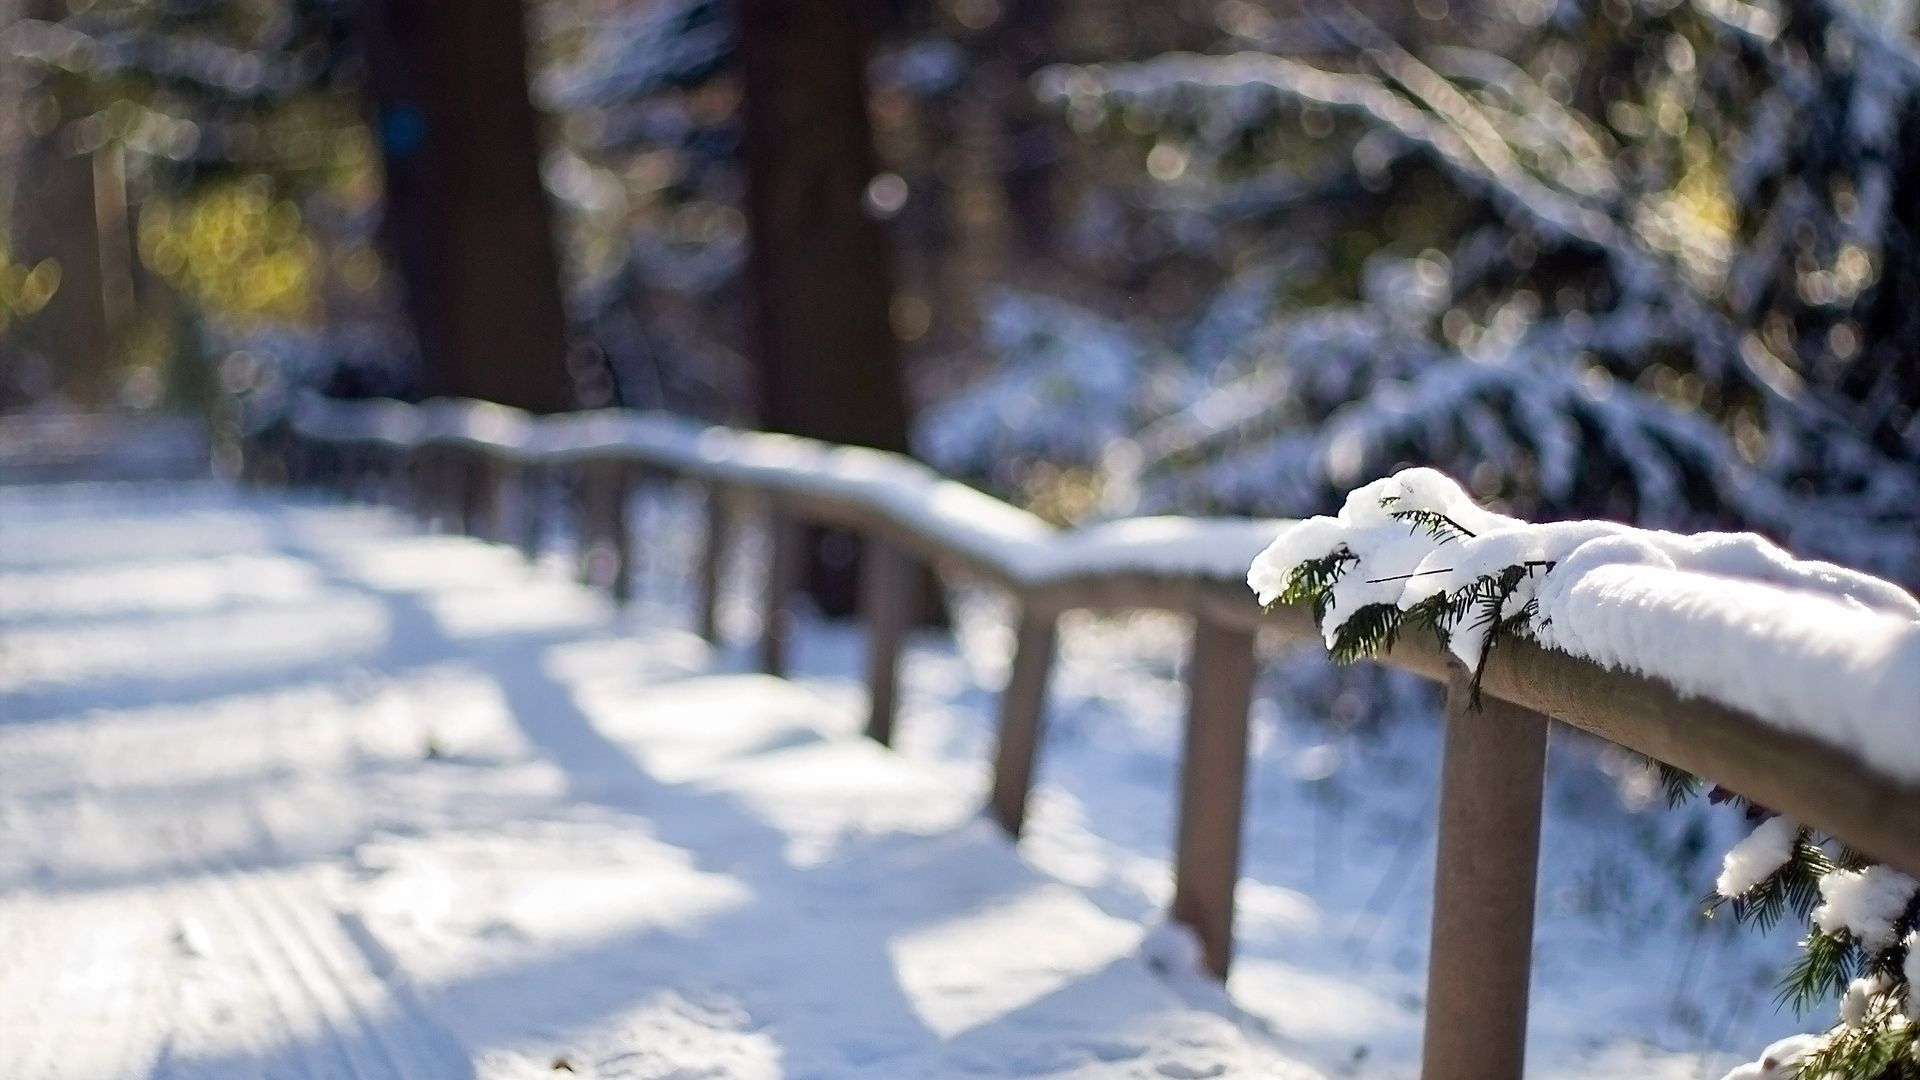 Macro Winter wallpaper picture hd